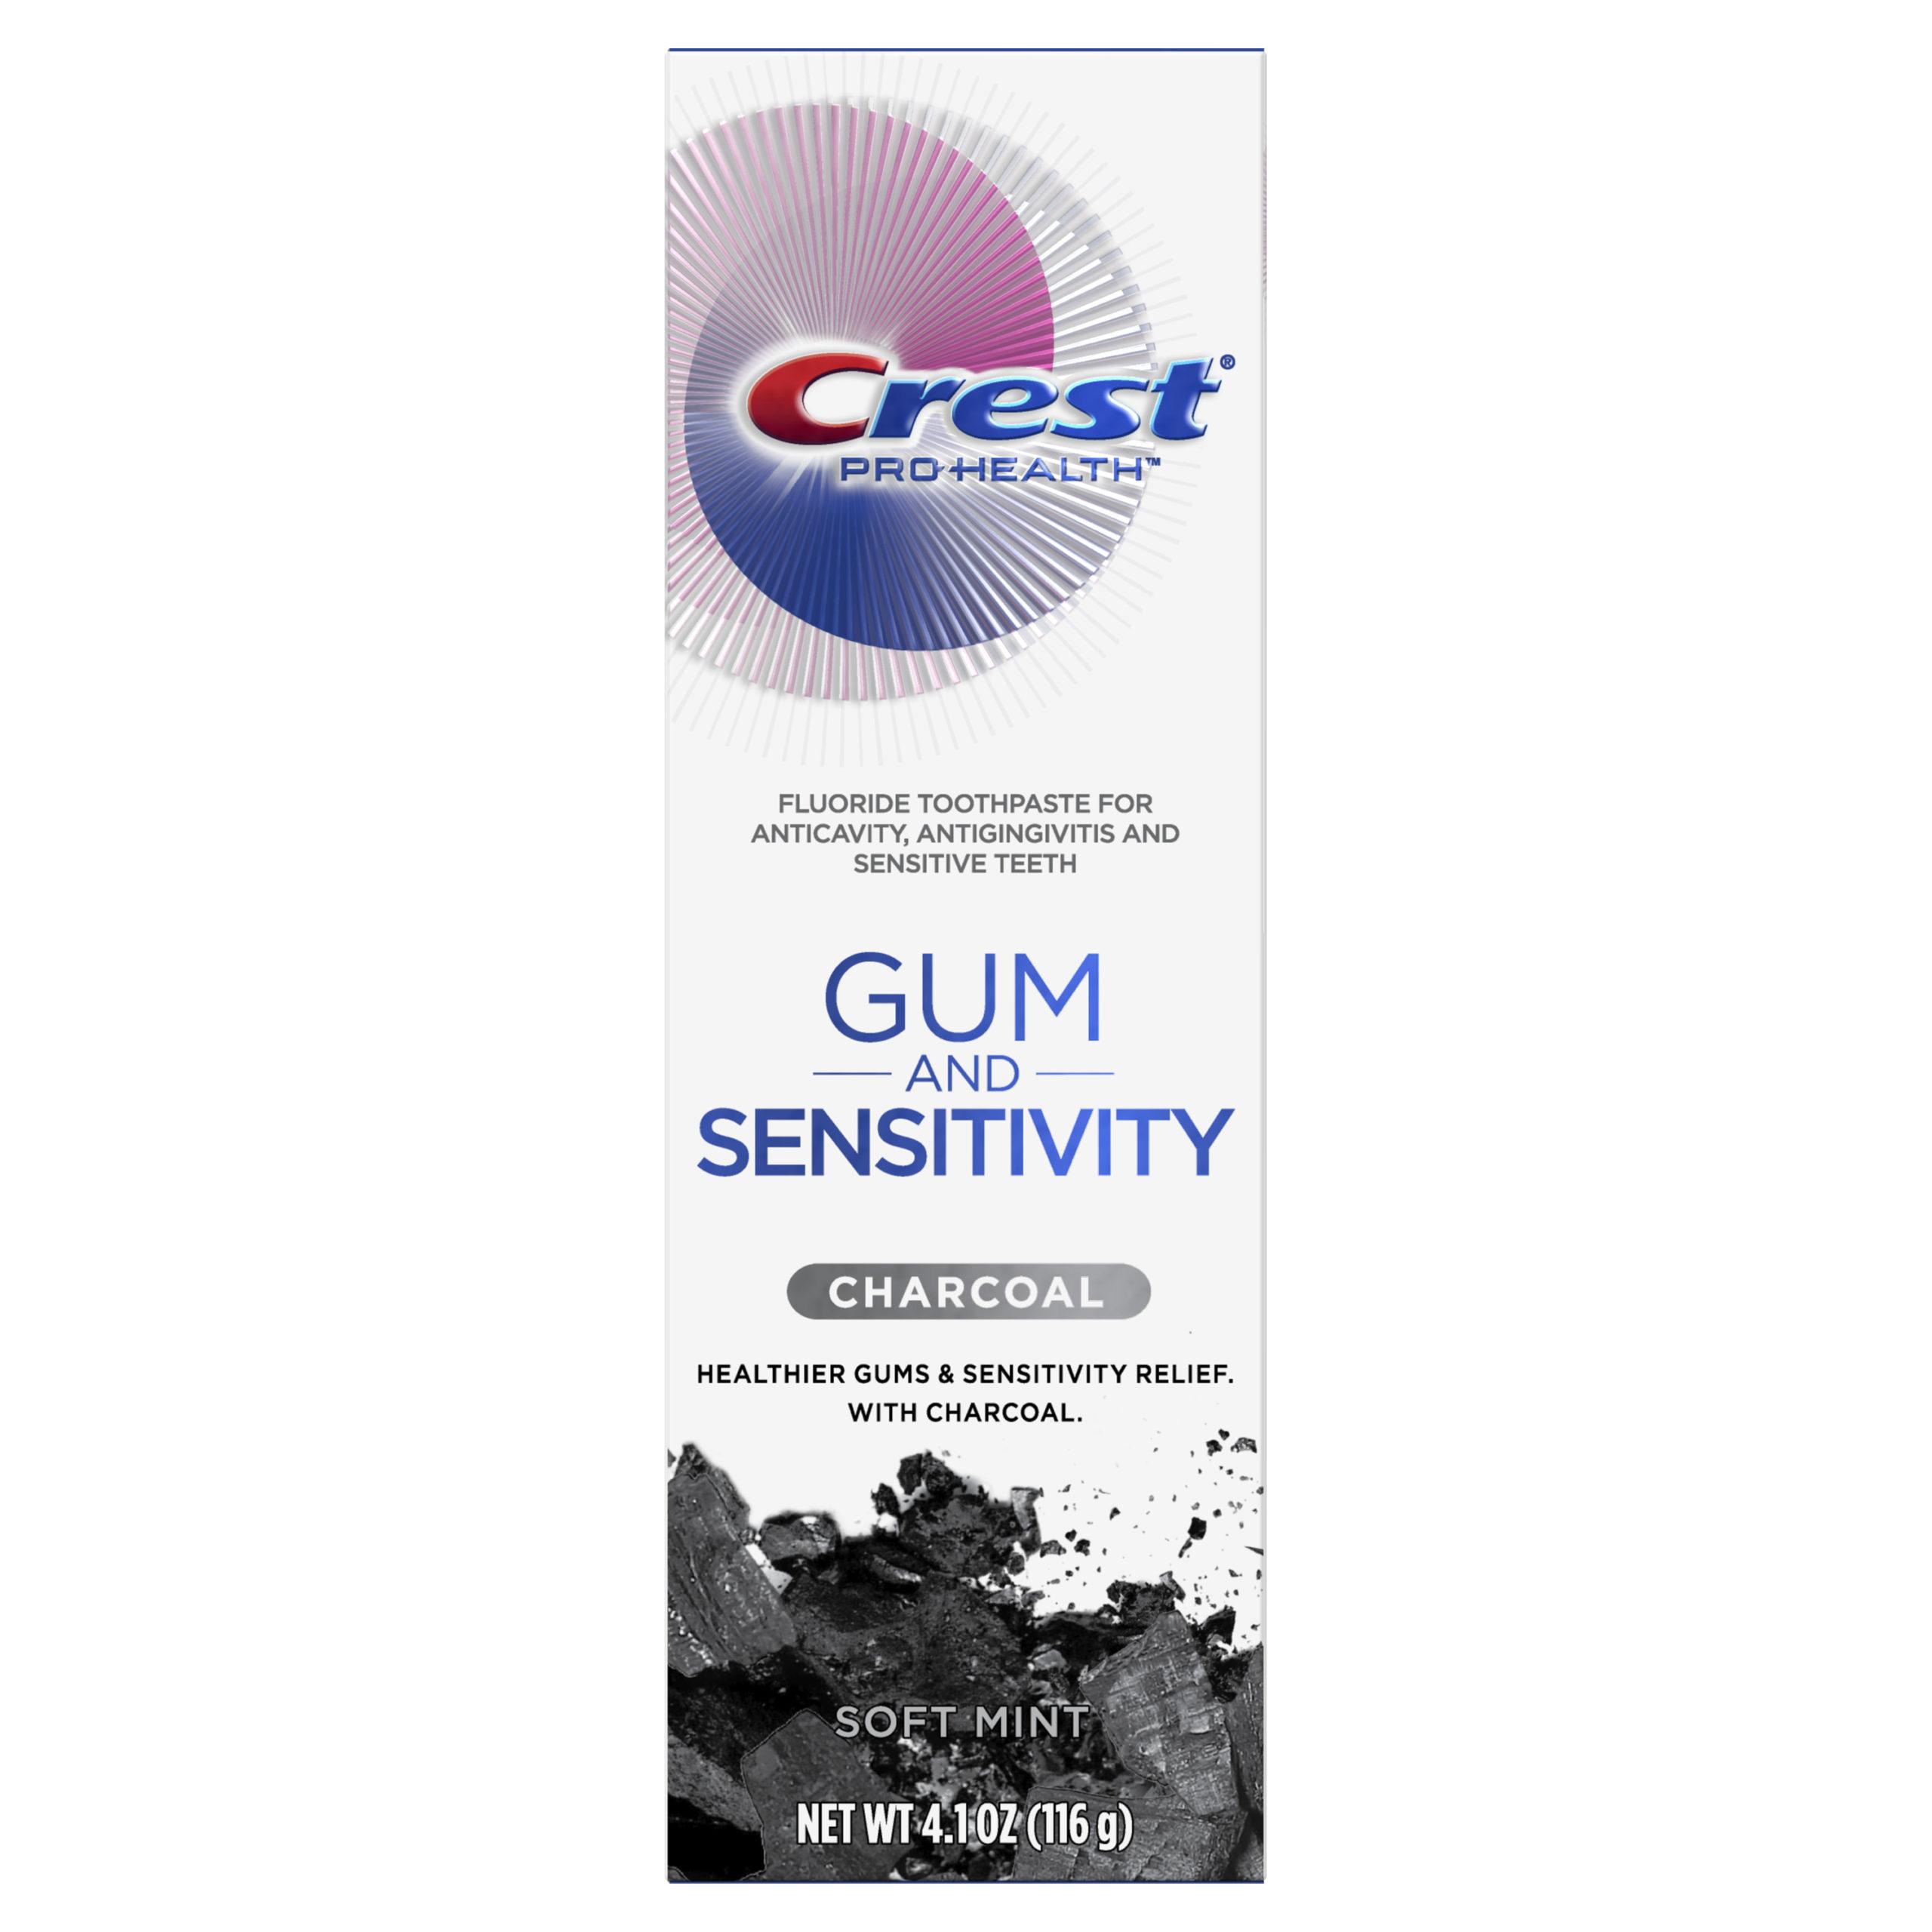 Crest Gum and Sensitivity Charcoal